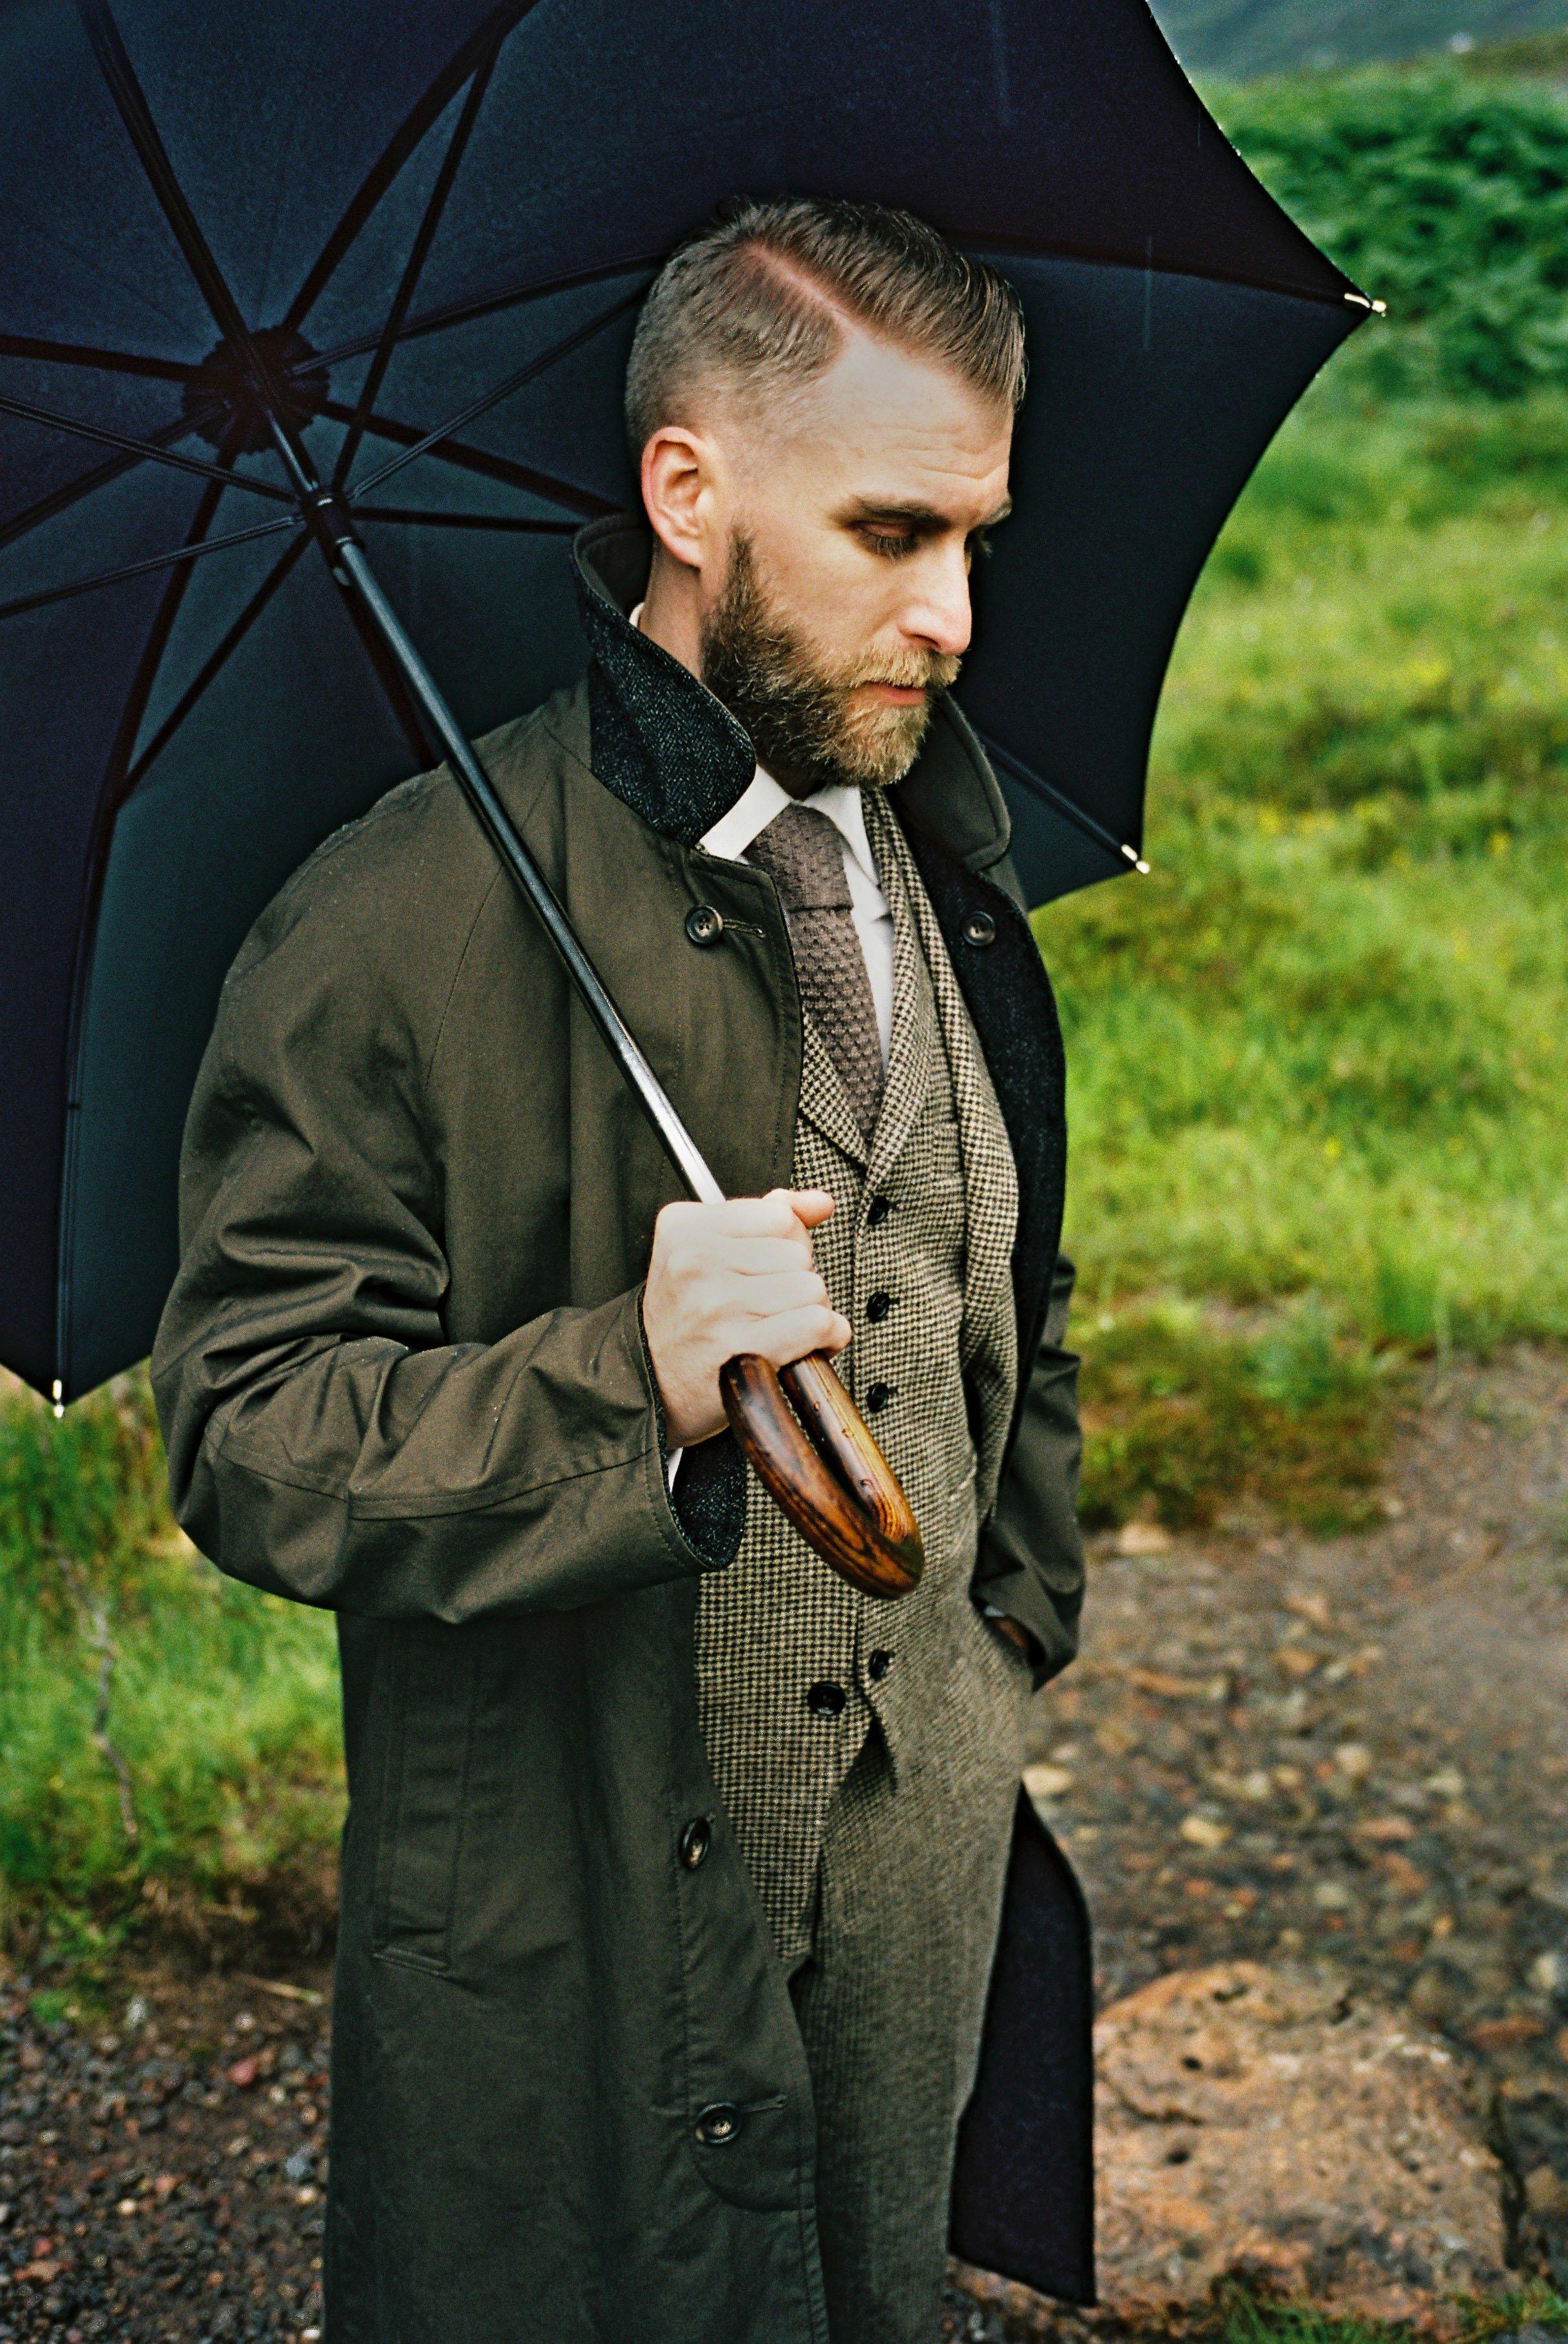 Glencoe by Laura Meek. Bespoke tailoring by Stewart Christie